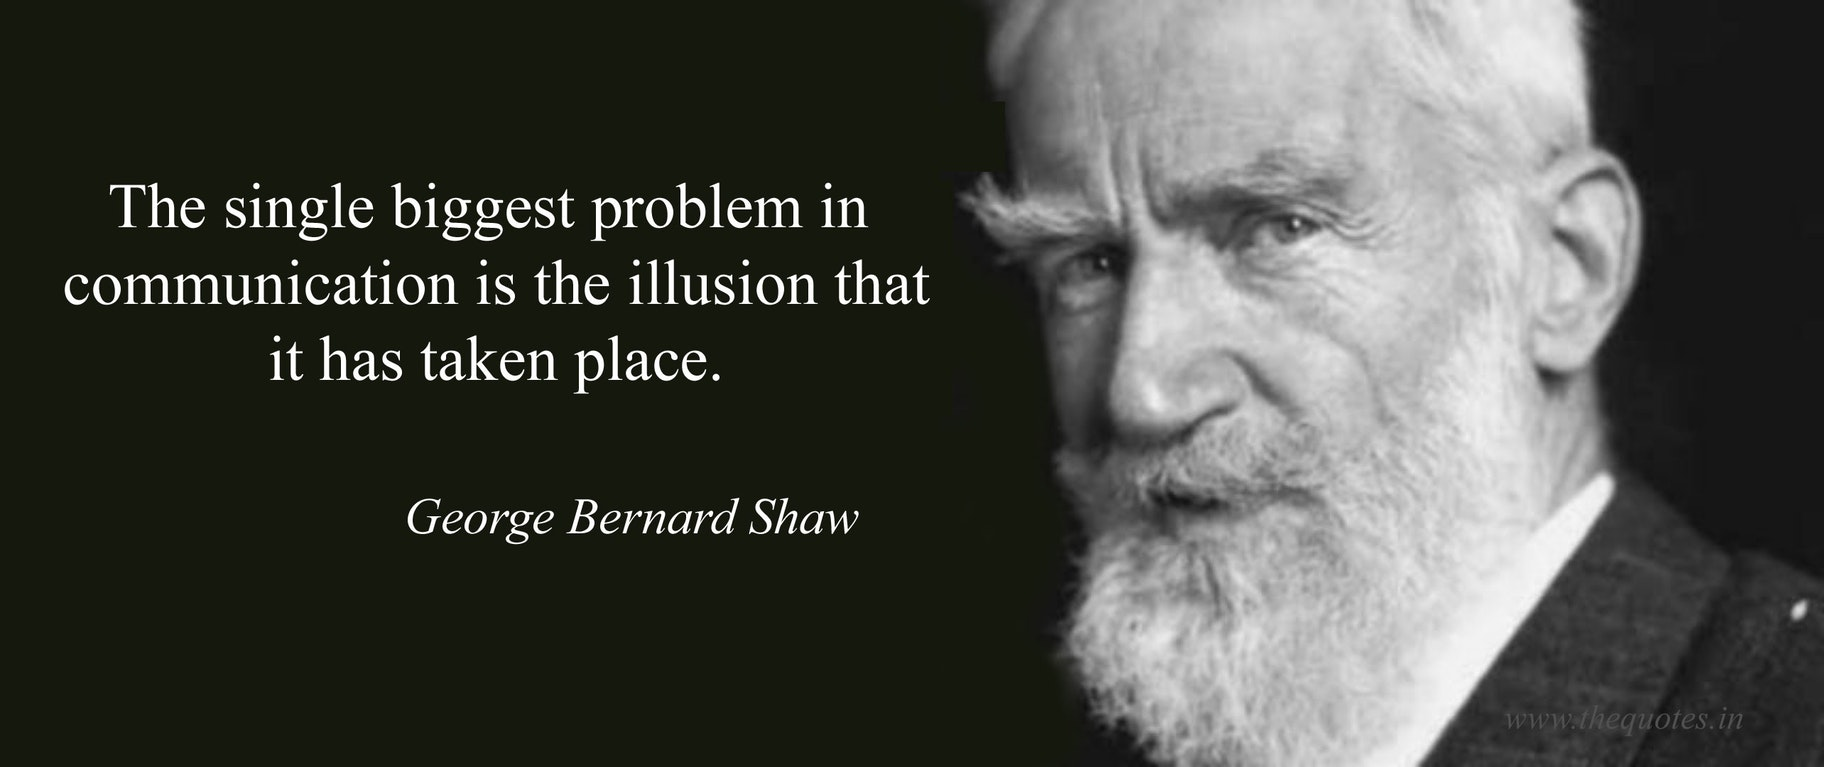 George Bernard Shaw quote communication